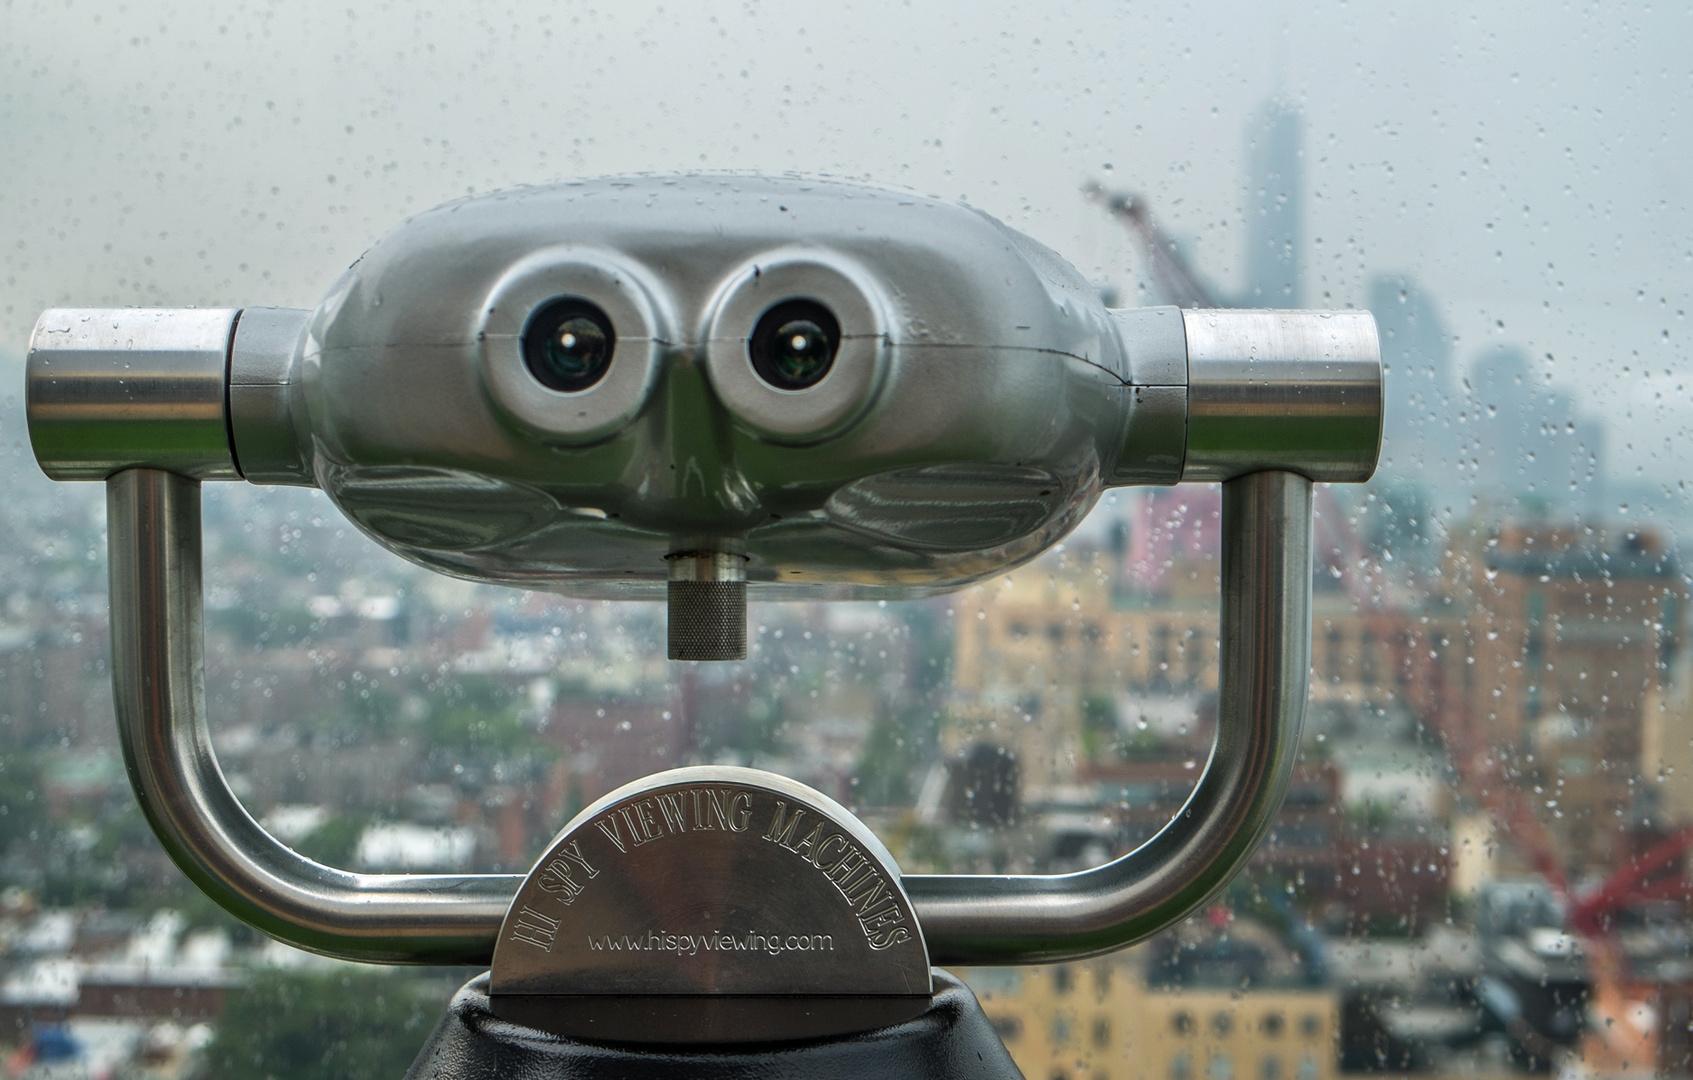 viewing Machine